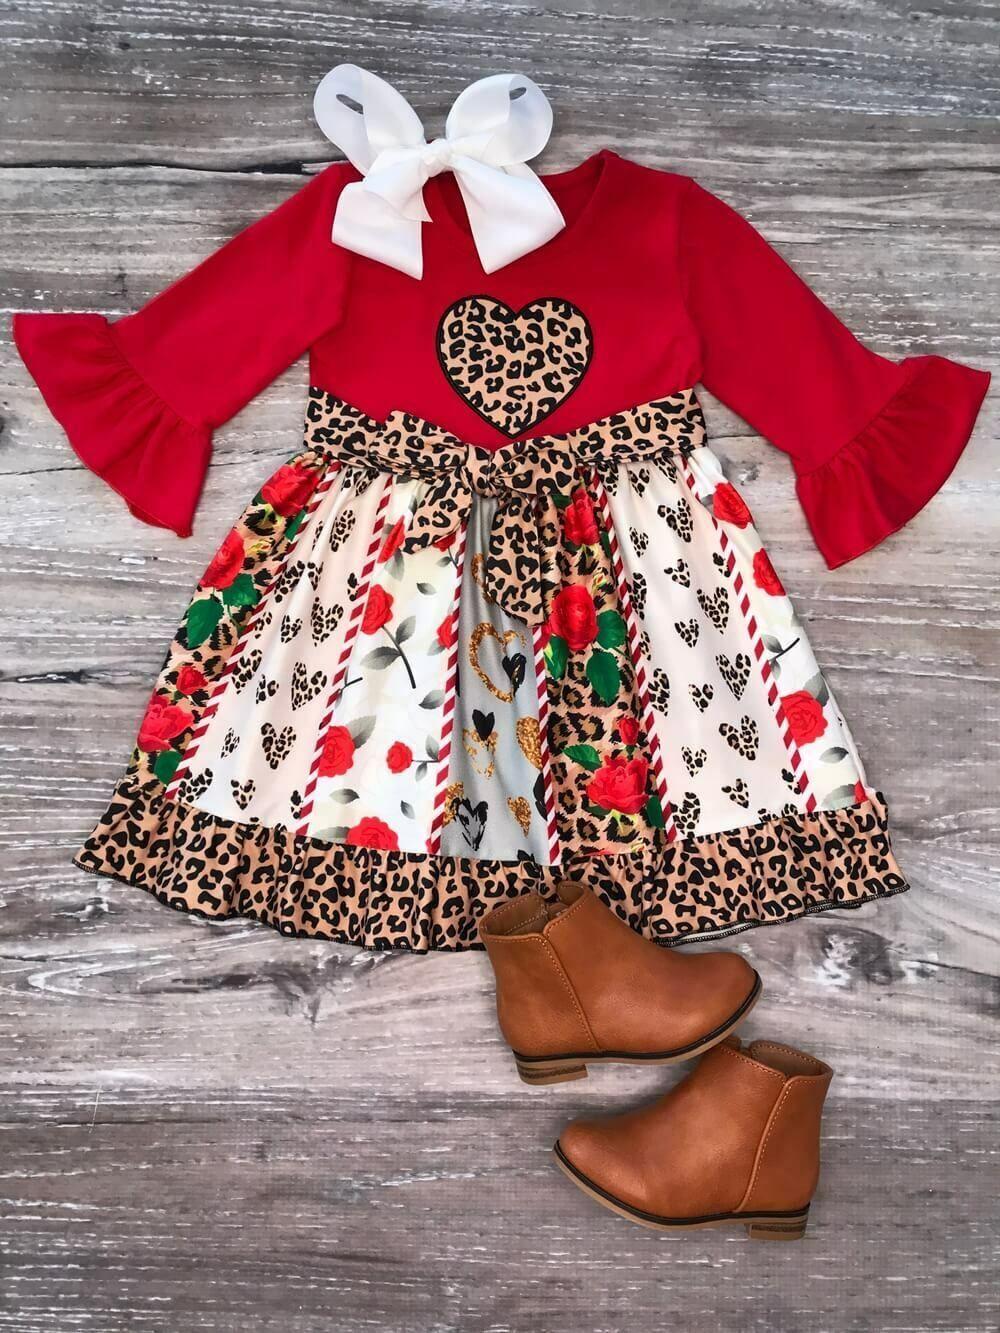 Girls Toddler Boutique Valentine S Day Dress Cheetah Heart Twirl 2t 3t 4t 5 6 7 Dress Honey Girls Long Sleeve Dress Pattern Girls Long Sleeve Dresses Long Sleeve Dress Pattern [ 1333 x 1000 Pixel ]